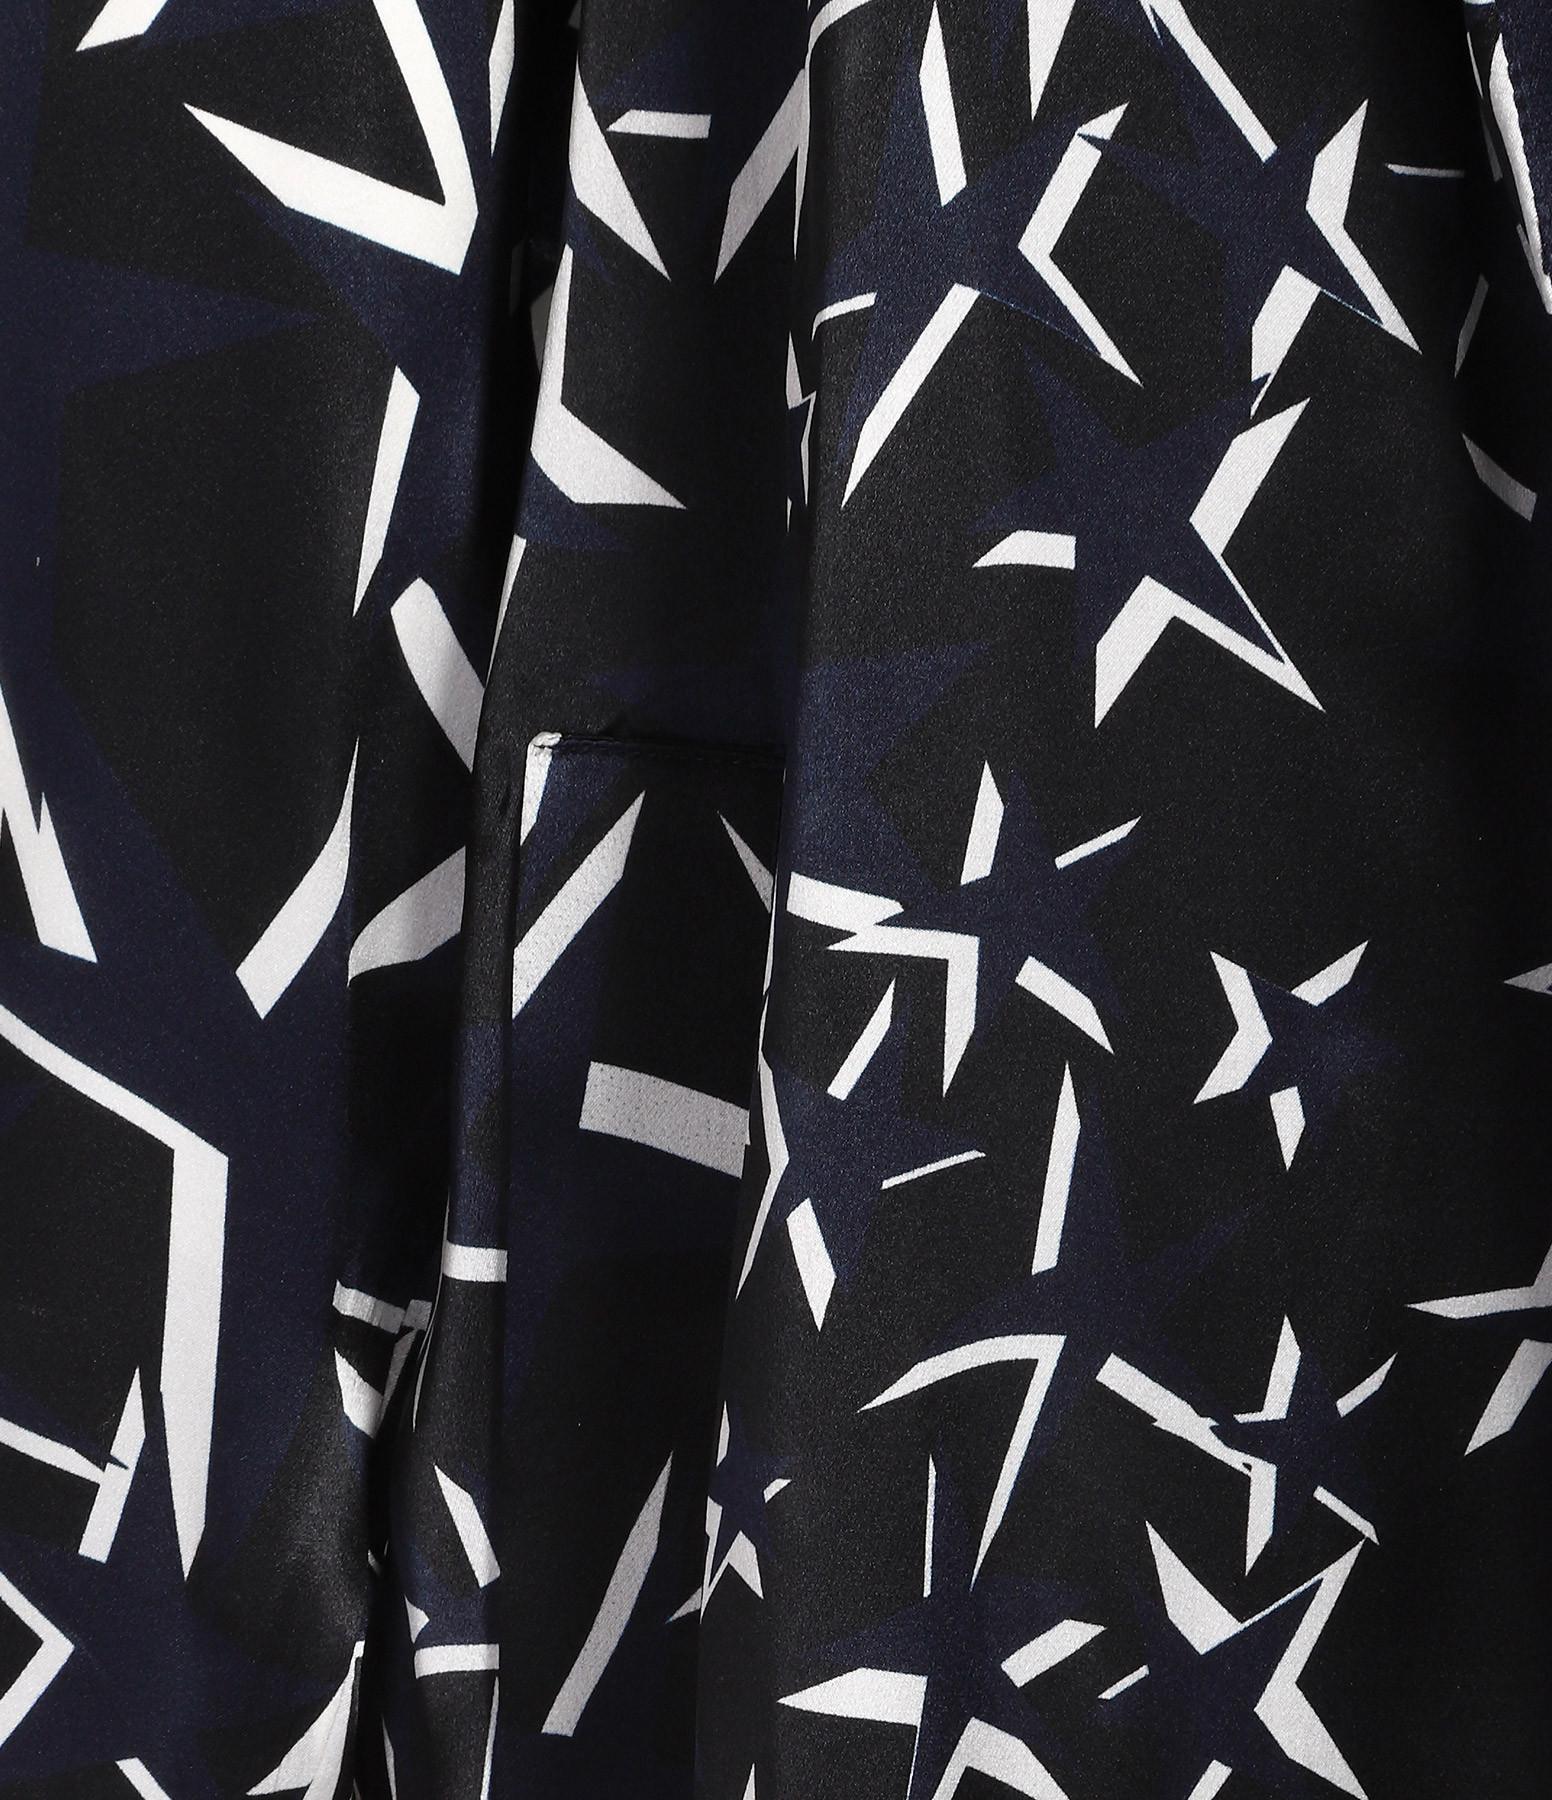 CAROLINA RITZLER - Manteau Sonat Soie Imprimé Etoile